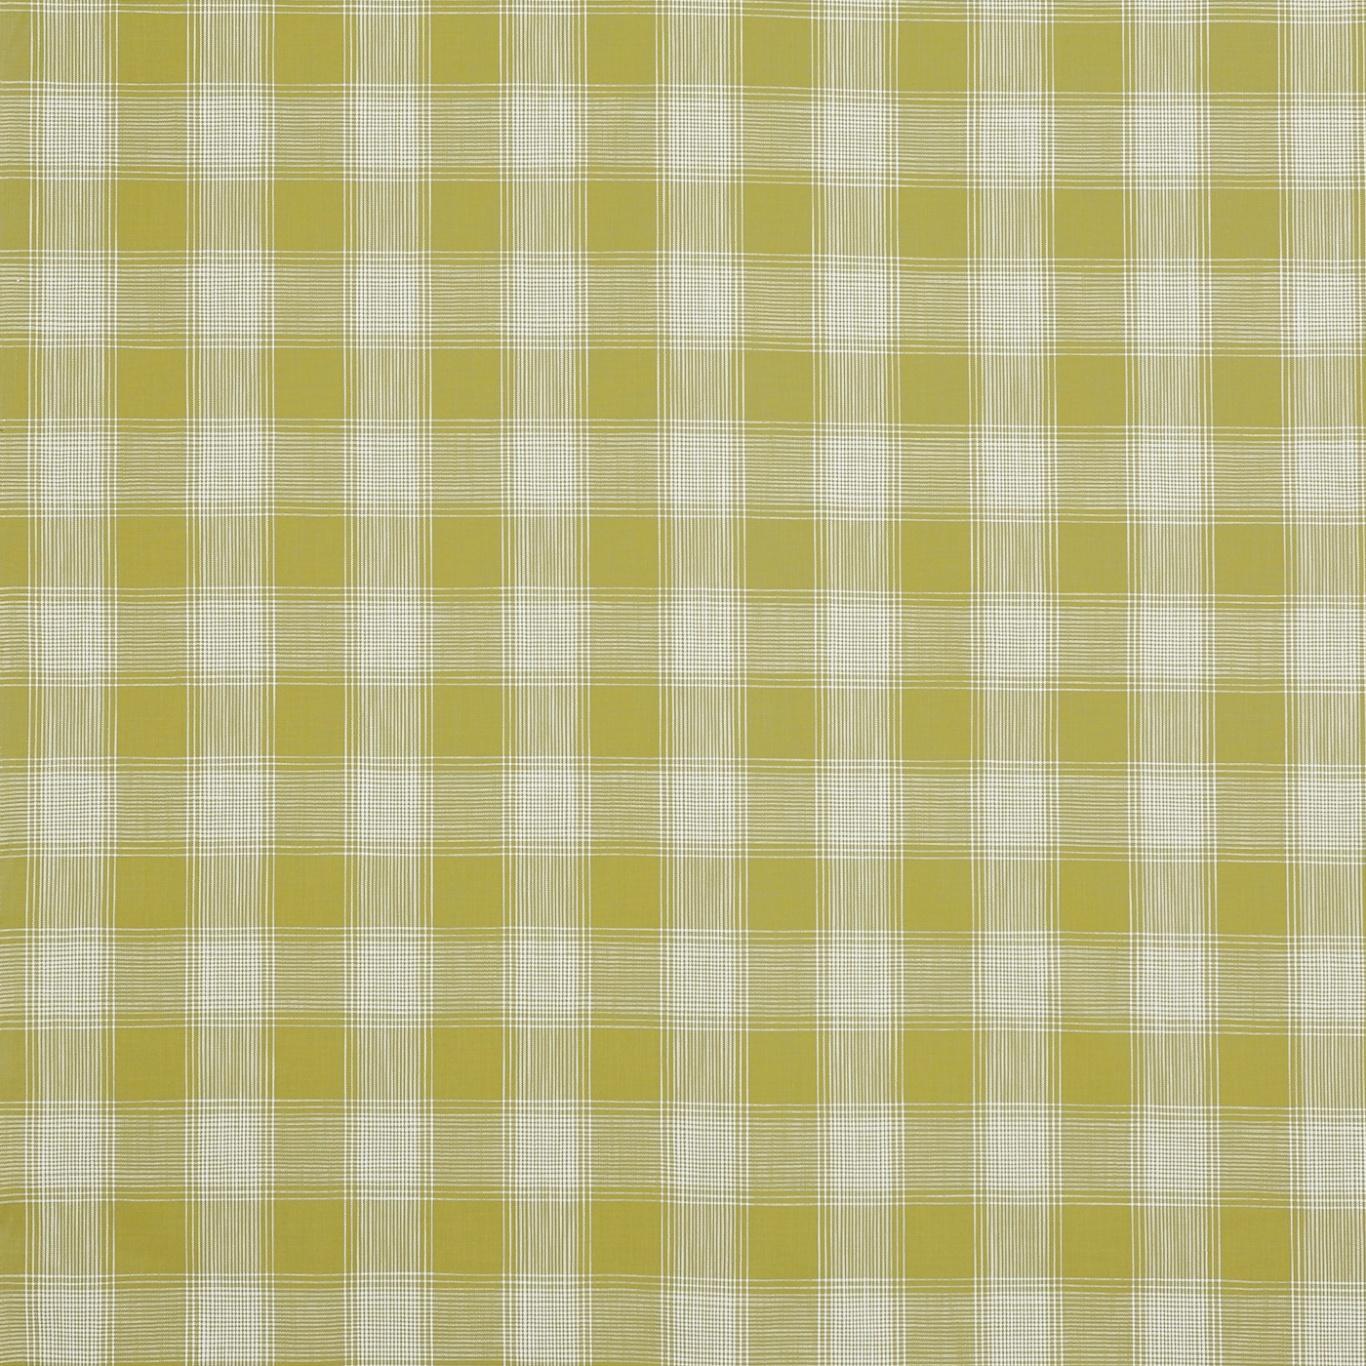 Image of Prestigious Portland Citron Fabric 3817/524